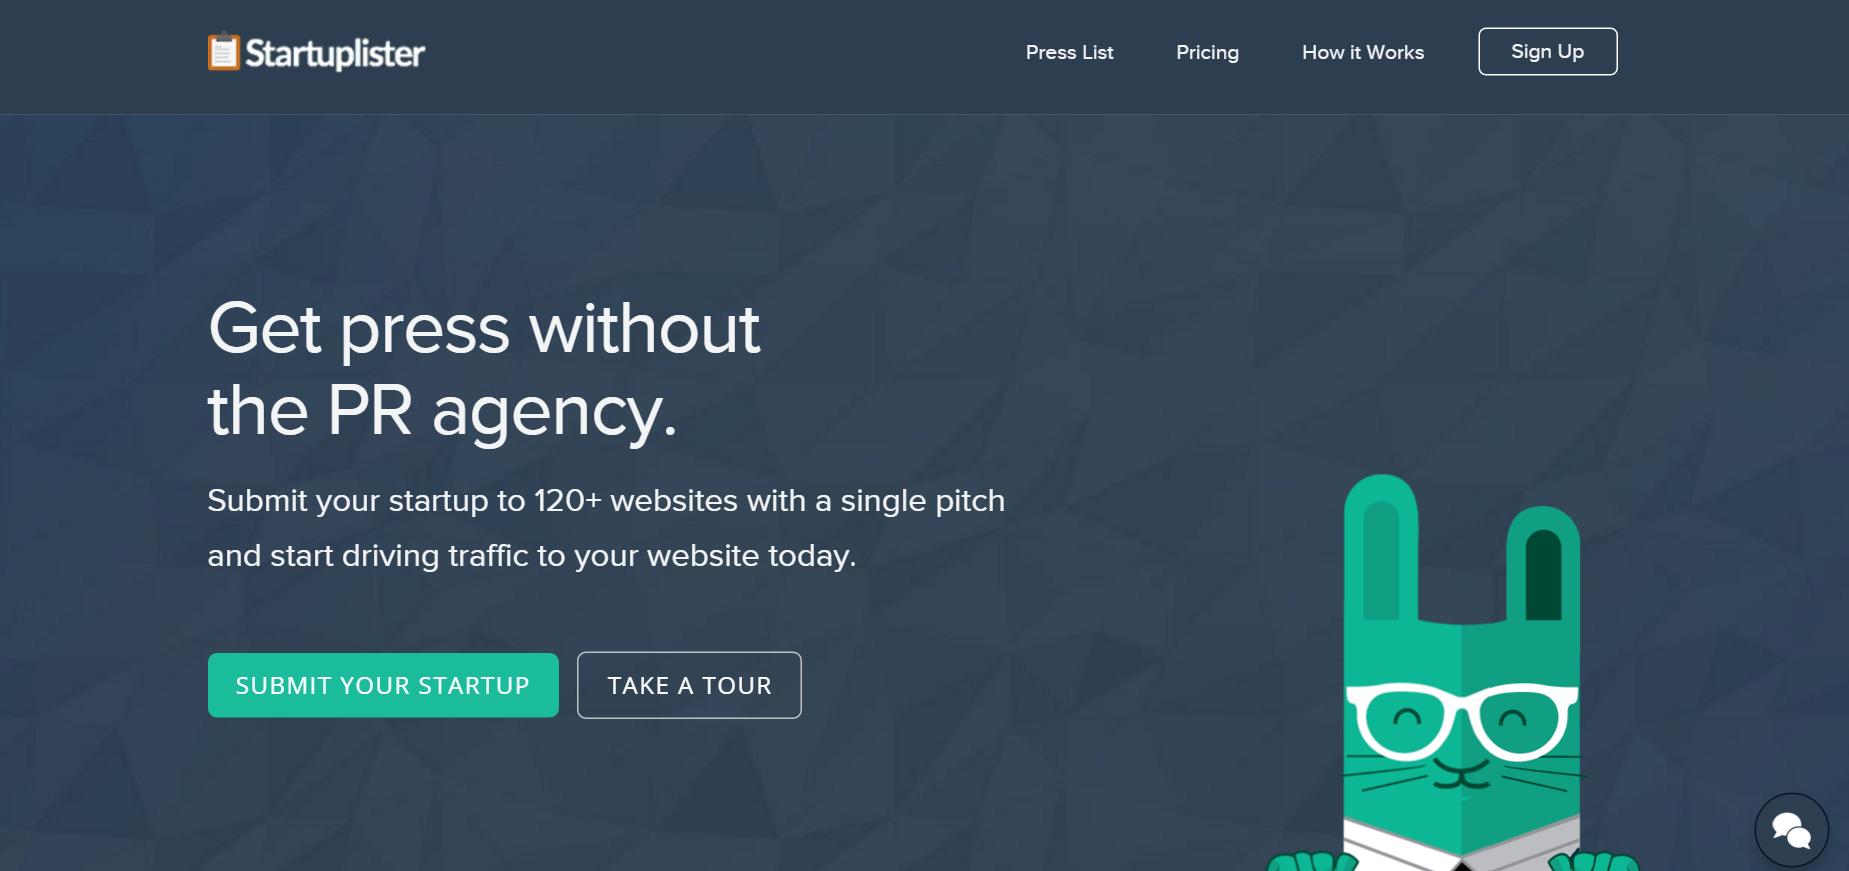 startuplister-i-migliori-strumenti-per-i-growth-hackers